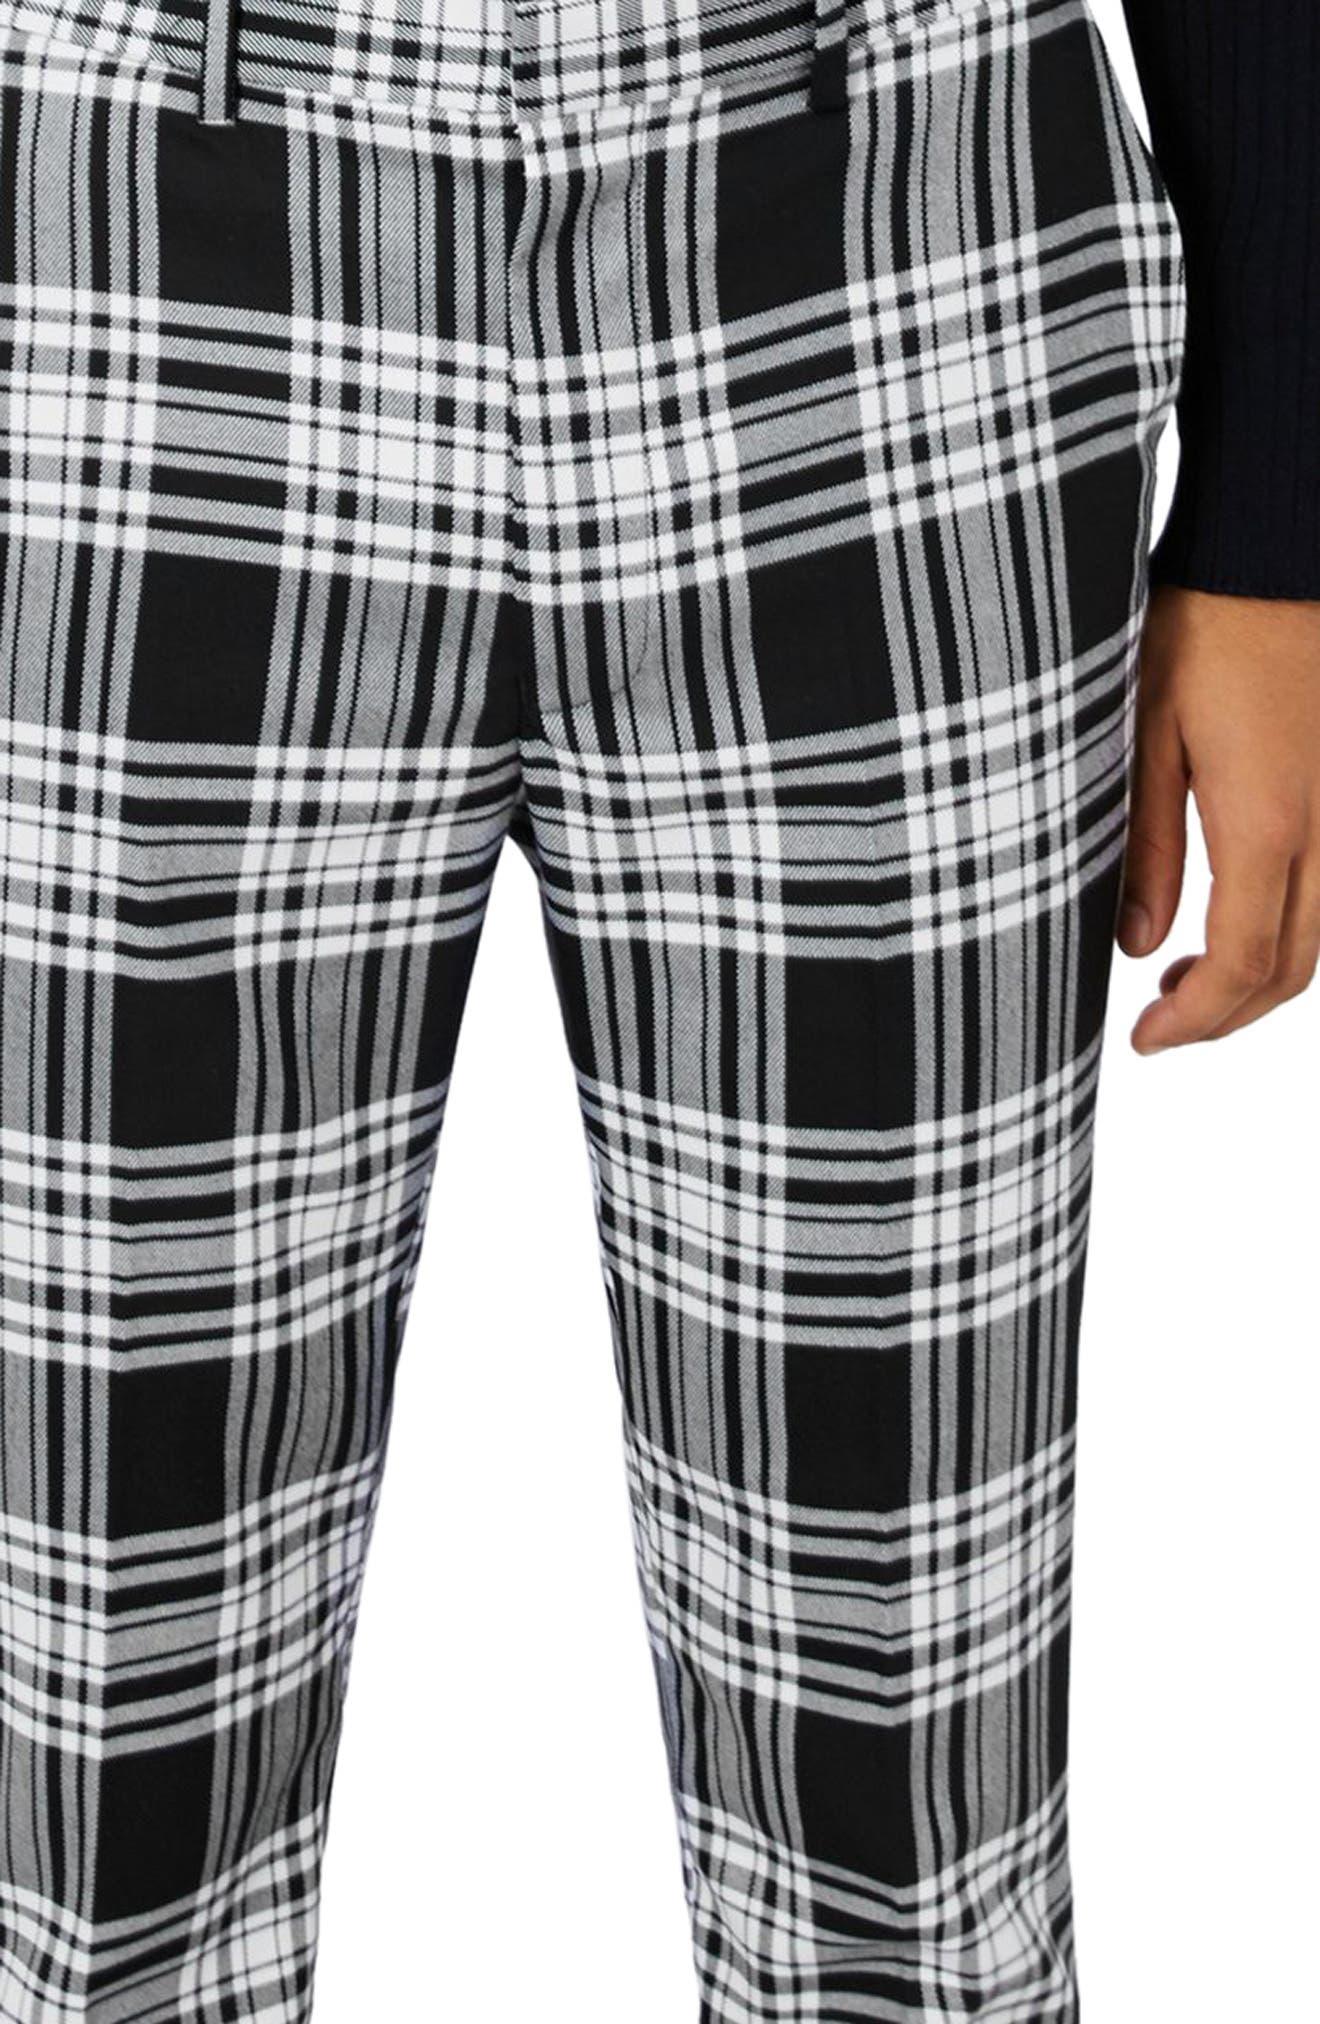 Plaid Ultra Skinny Fit Crop Trousers,                             Alternate thumbnail 4, color,                             Black Multi